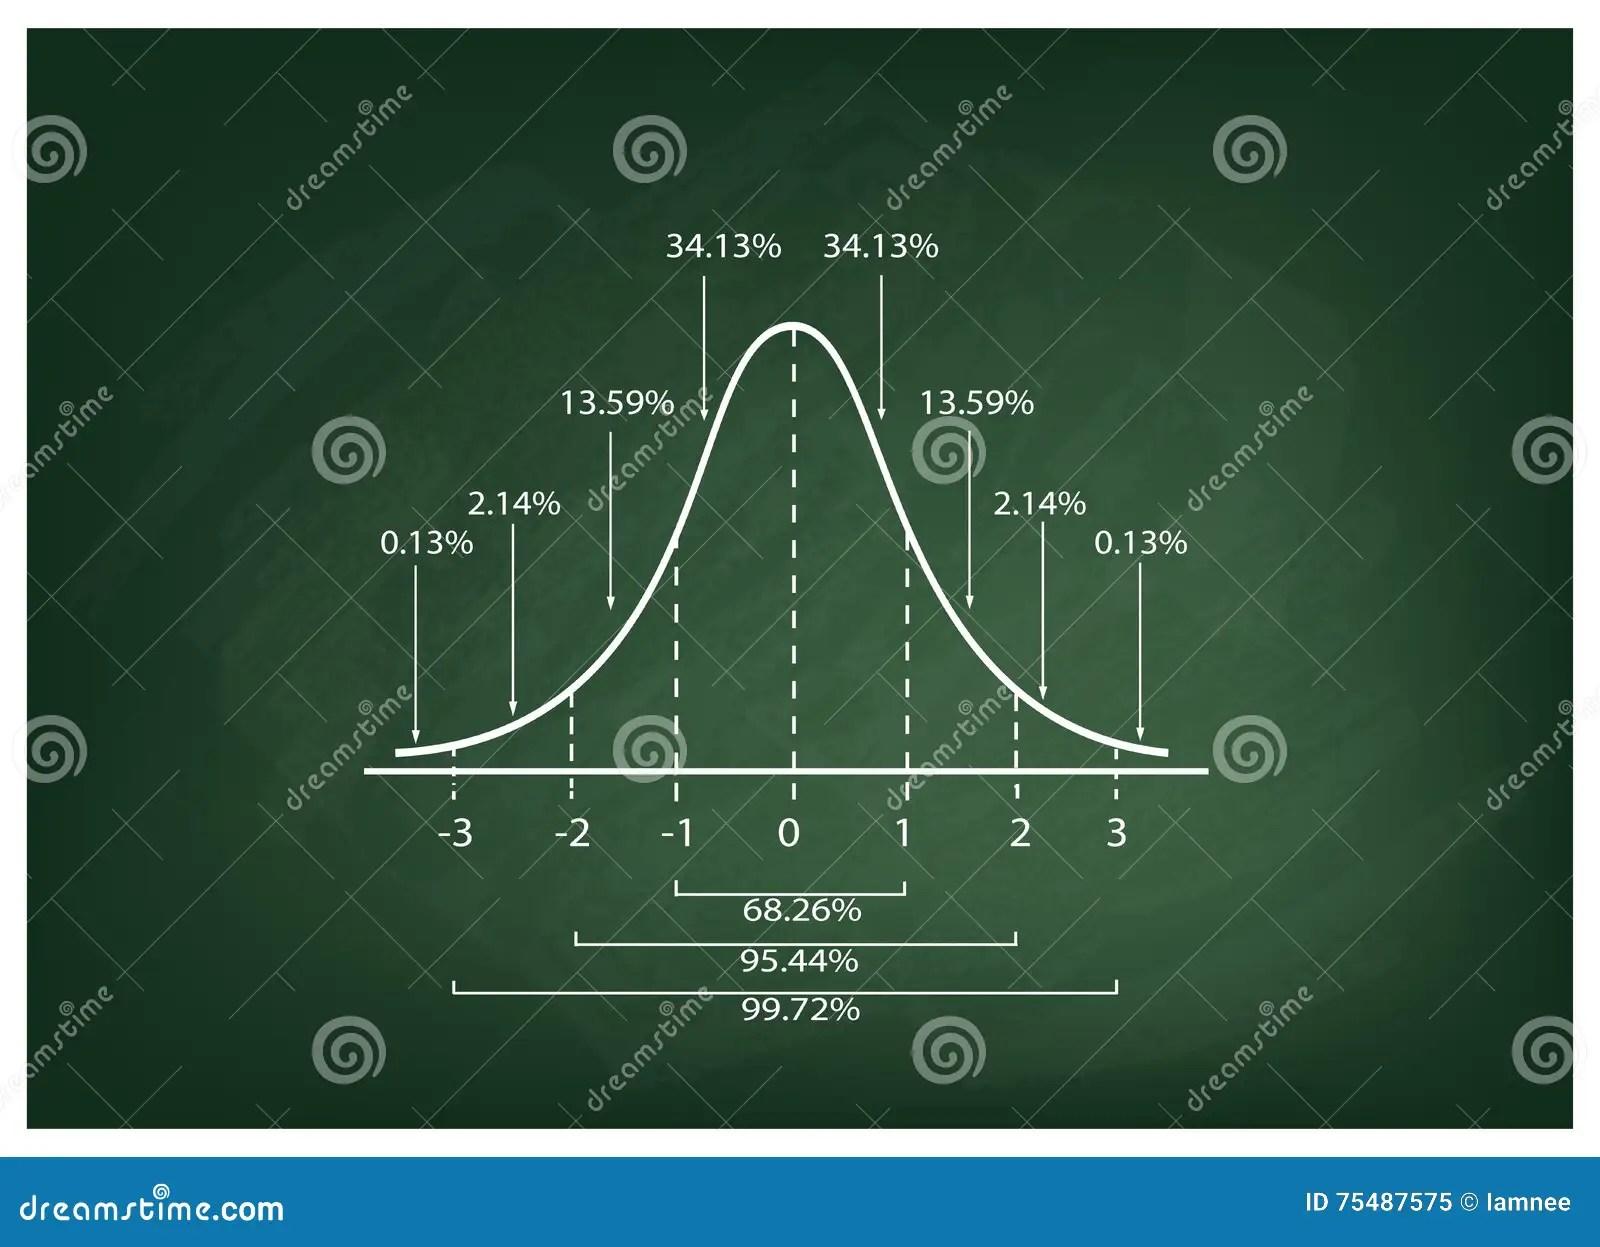 Normal Distribution Curve Diagram On Chalkboard Background